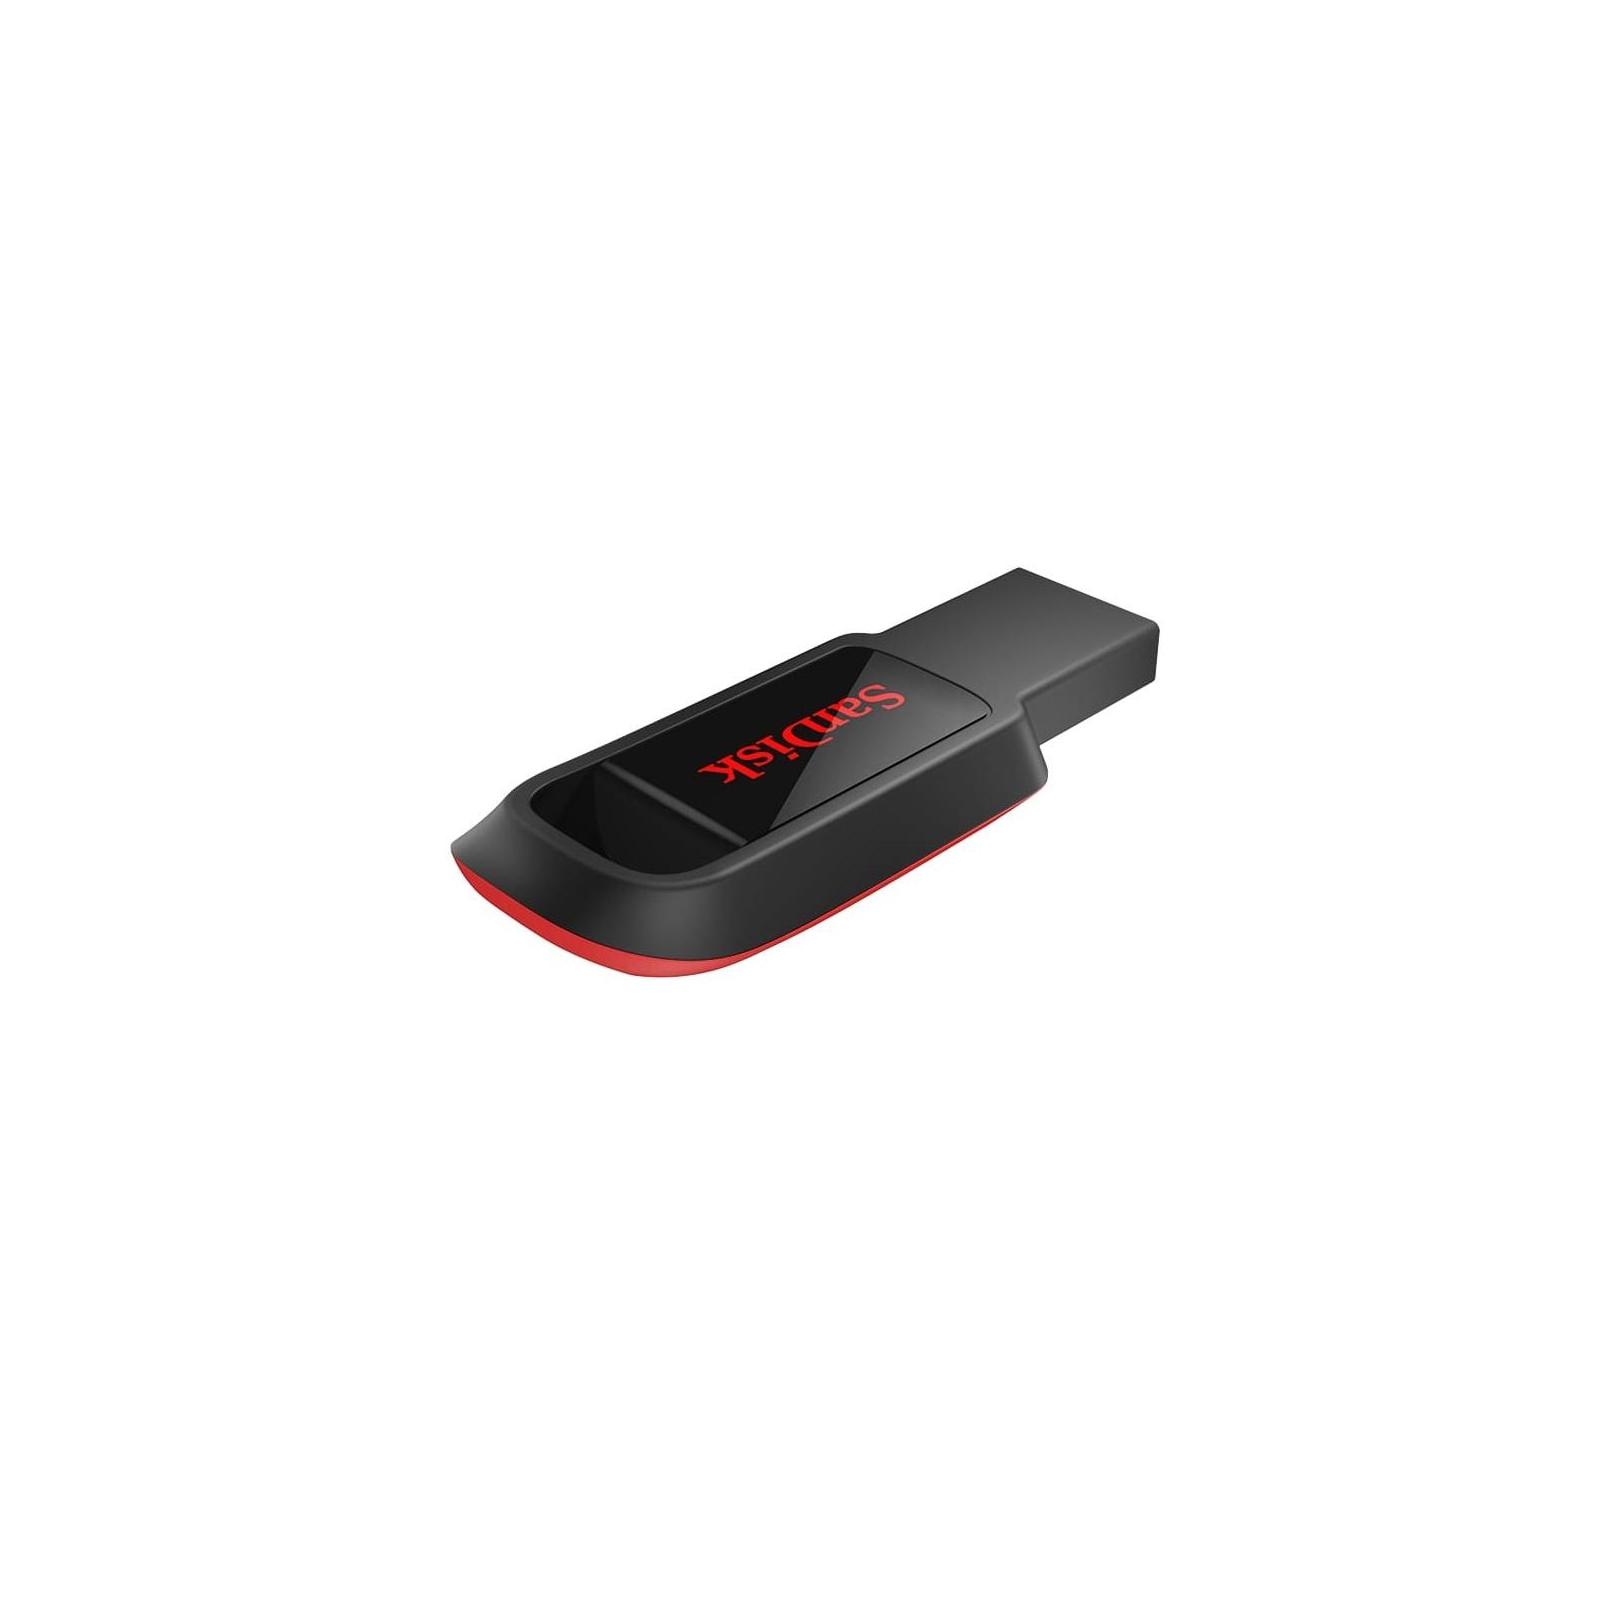 USB флеш накопитель SanDisk 16GB Cruzer Spark USB 2.0 (SDCZ61-016G-G35) изображение 5